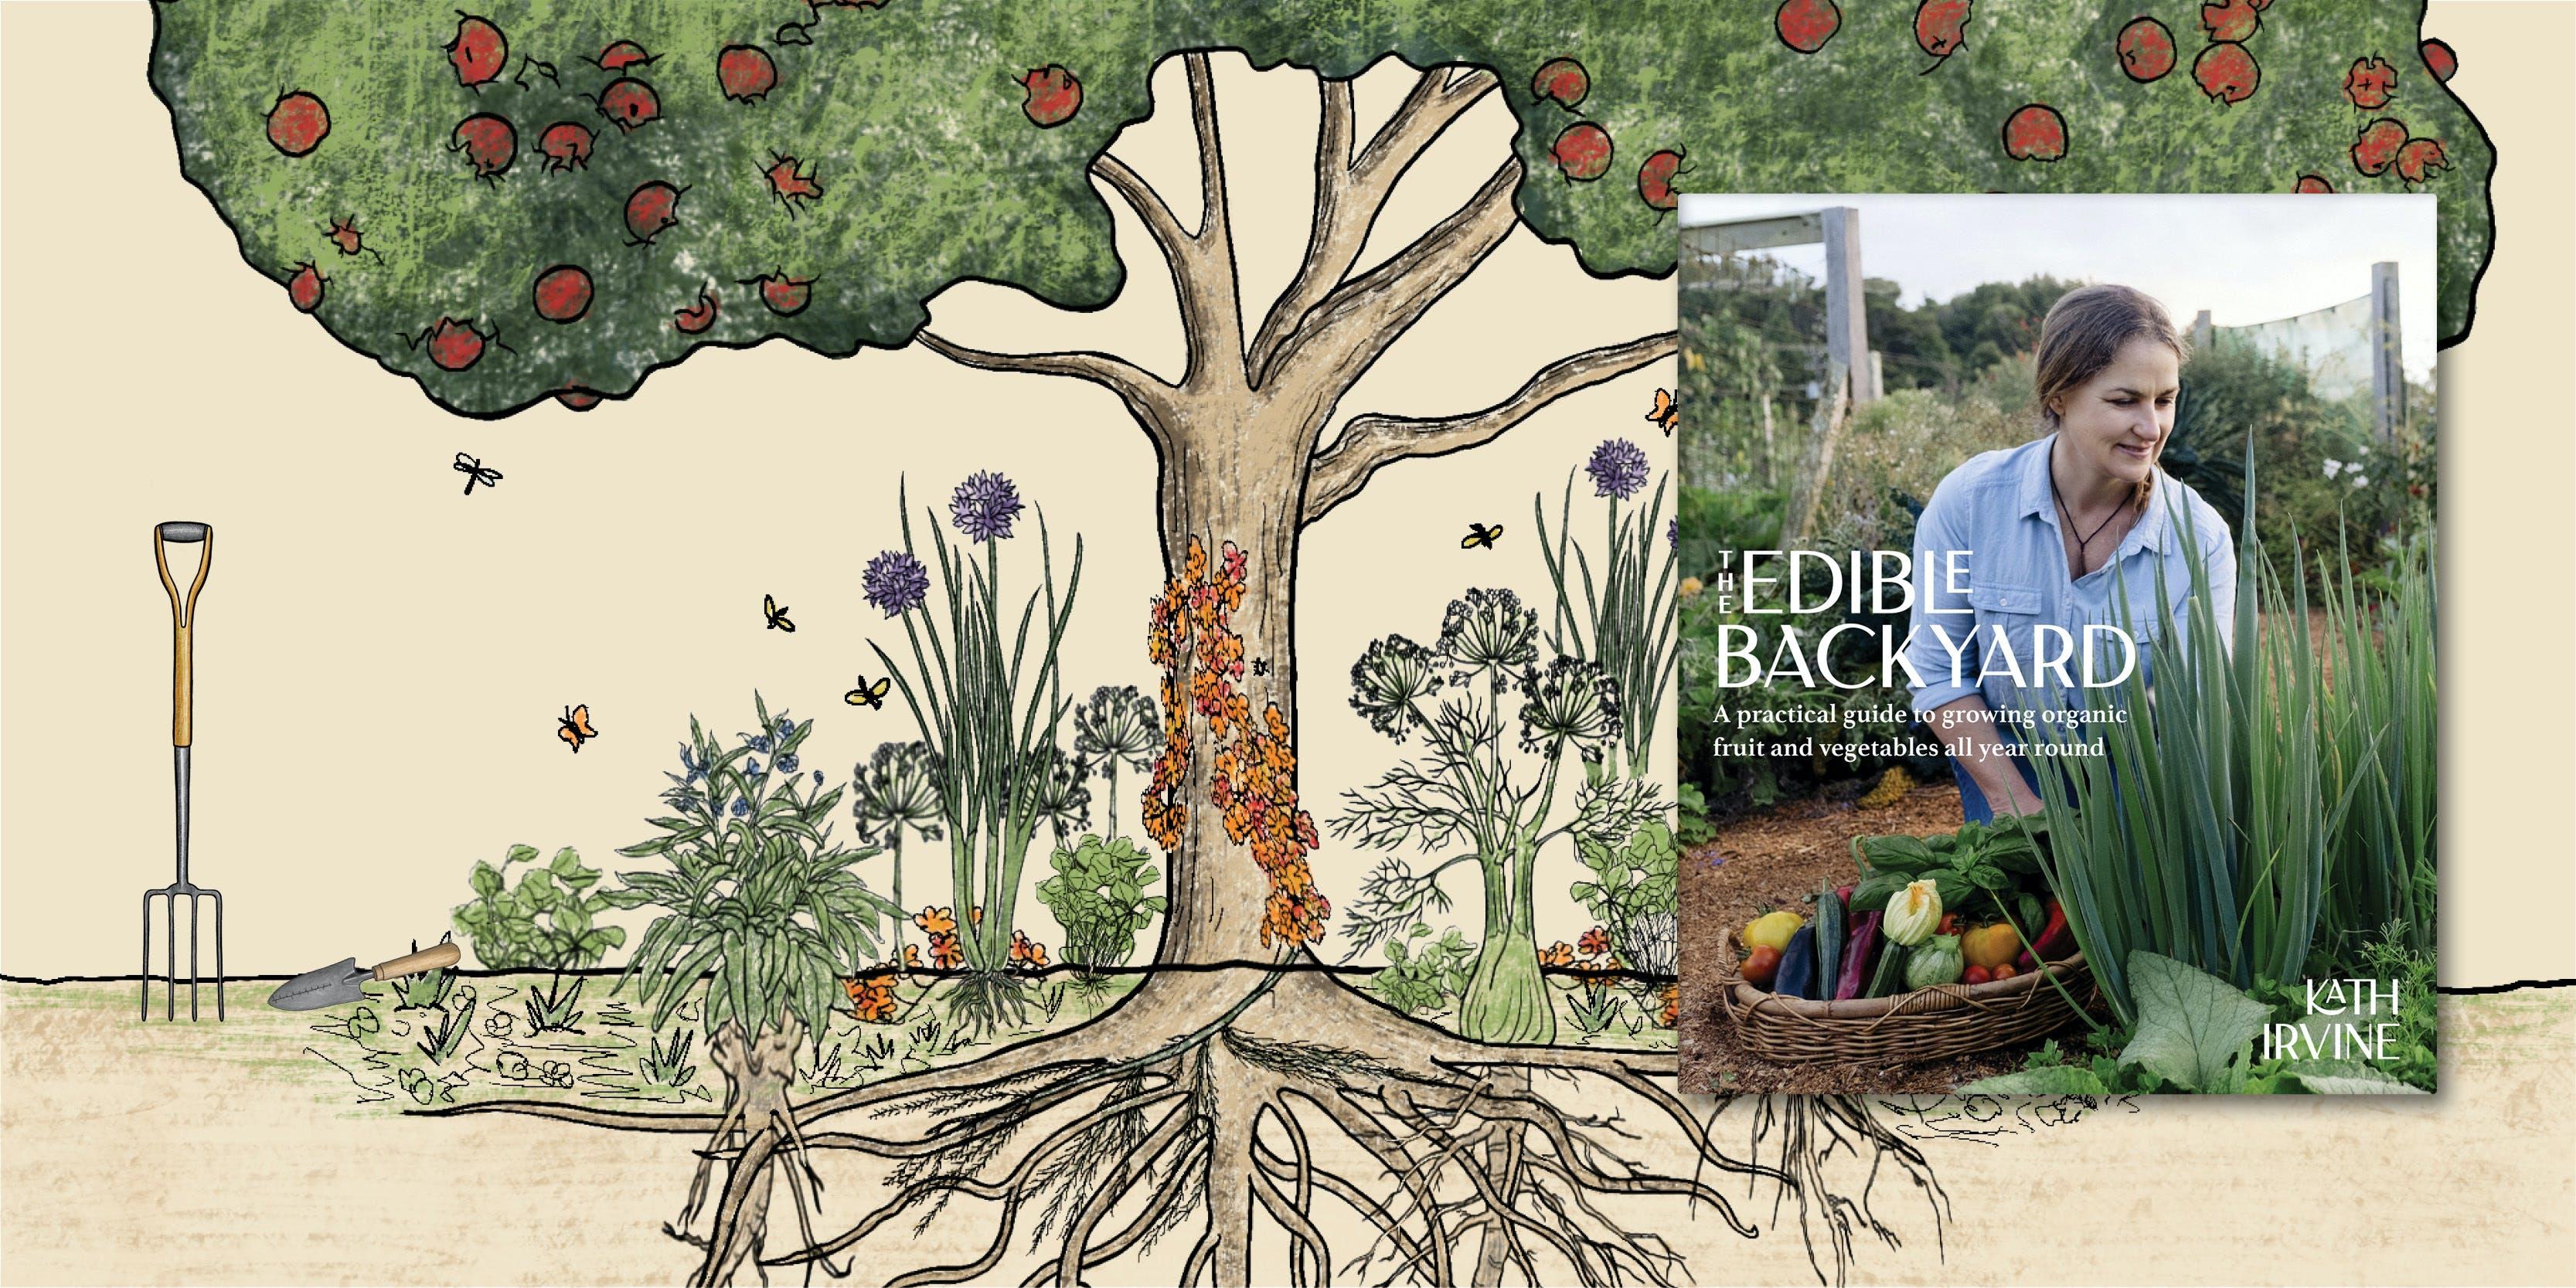 Kath Irvine's 5 favourite spring crops